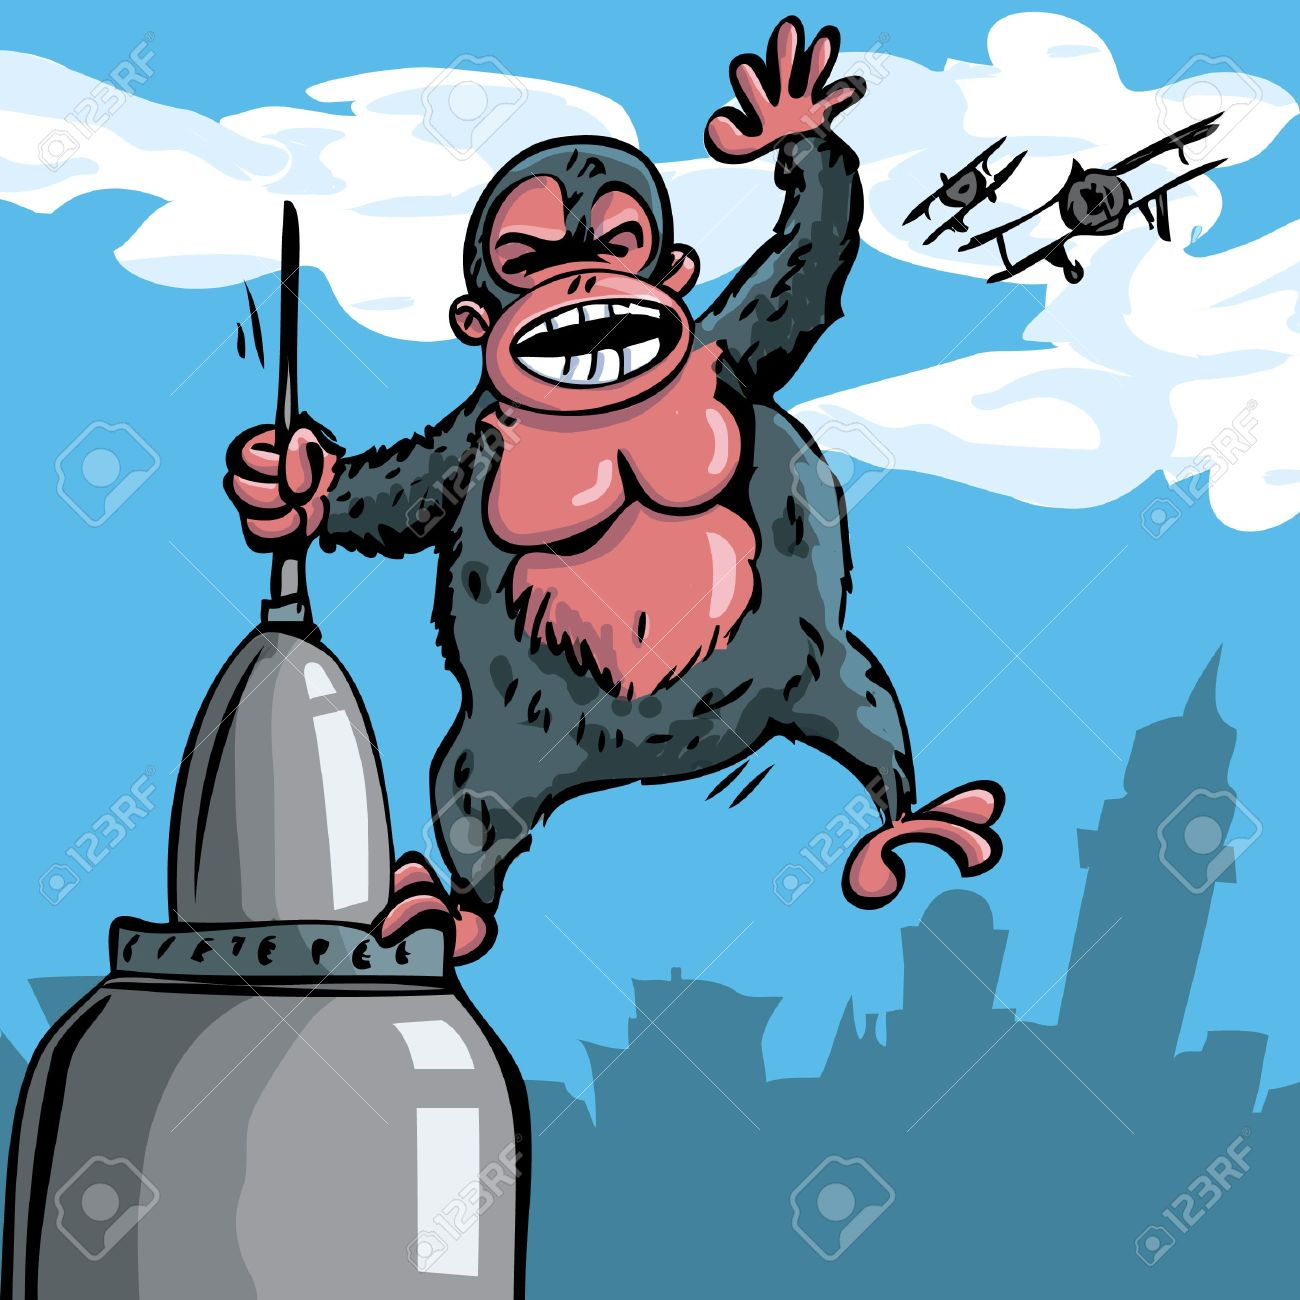 cartoon king kong hanging on a skyscraper biplanes in the sky rh 123rf com King Kong Shadow Clip Art King Kong Silhouette